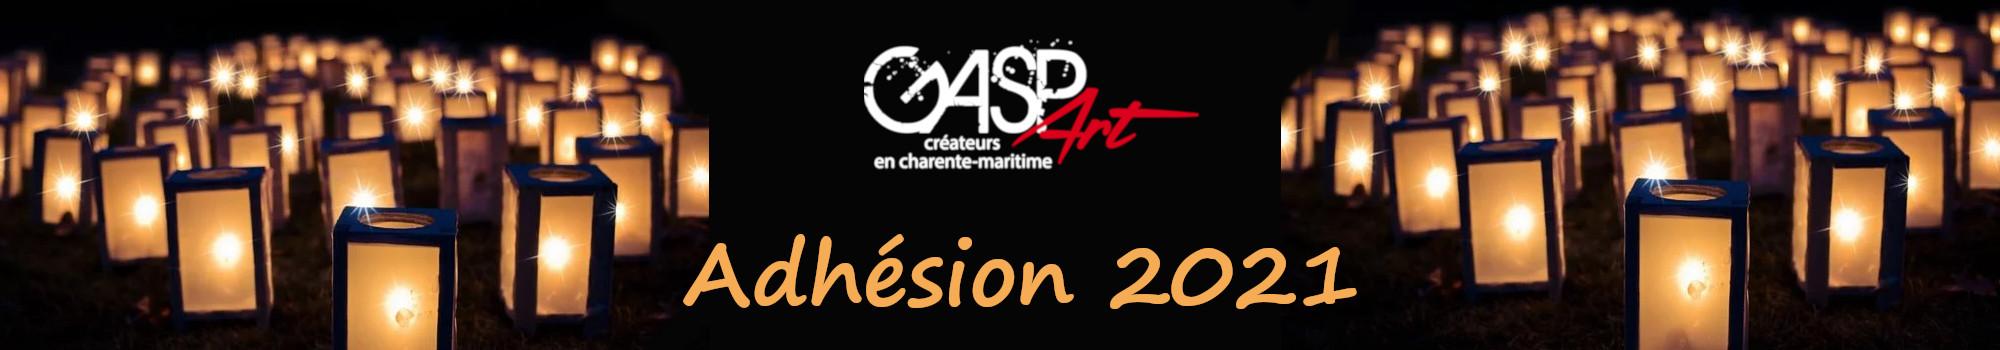 adhesion asso gaspart 17